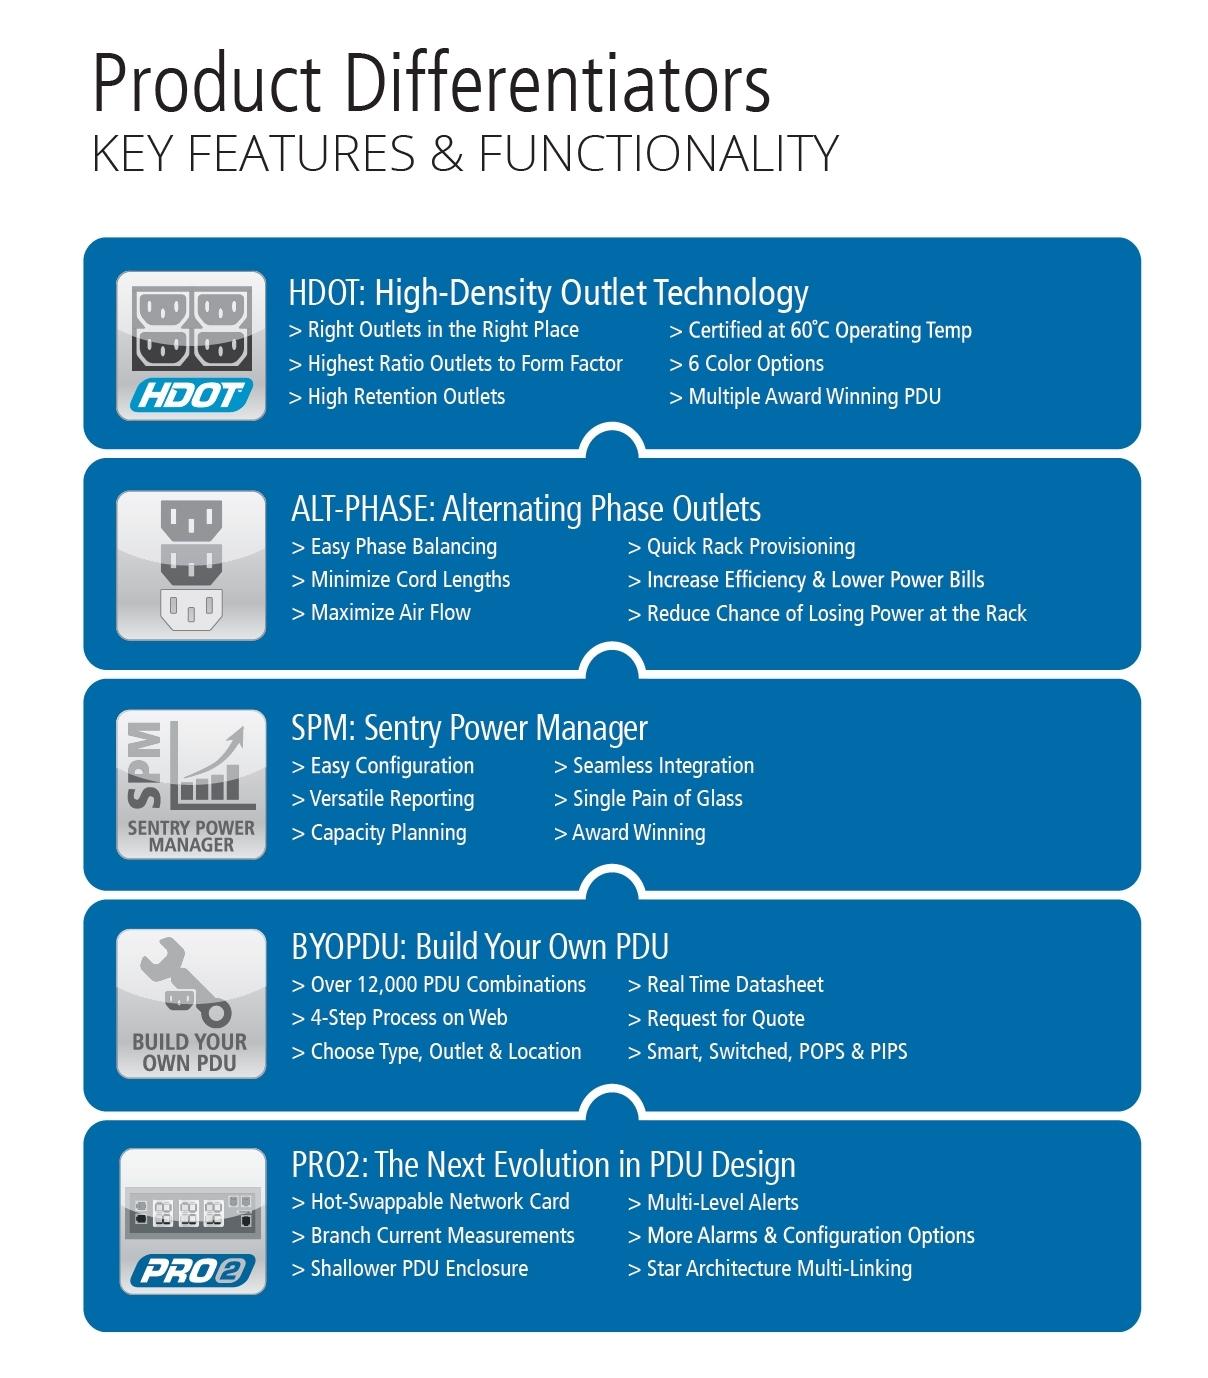 Server Tech Product Differentiators HDOT Alt Phase SPM BYO PDU Pro2